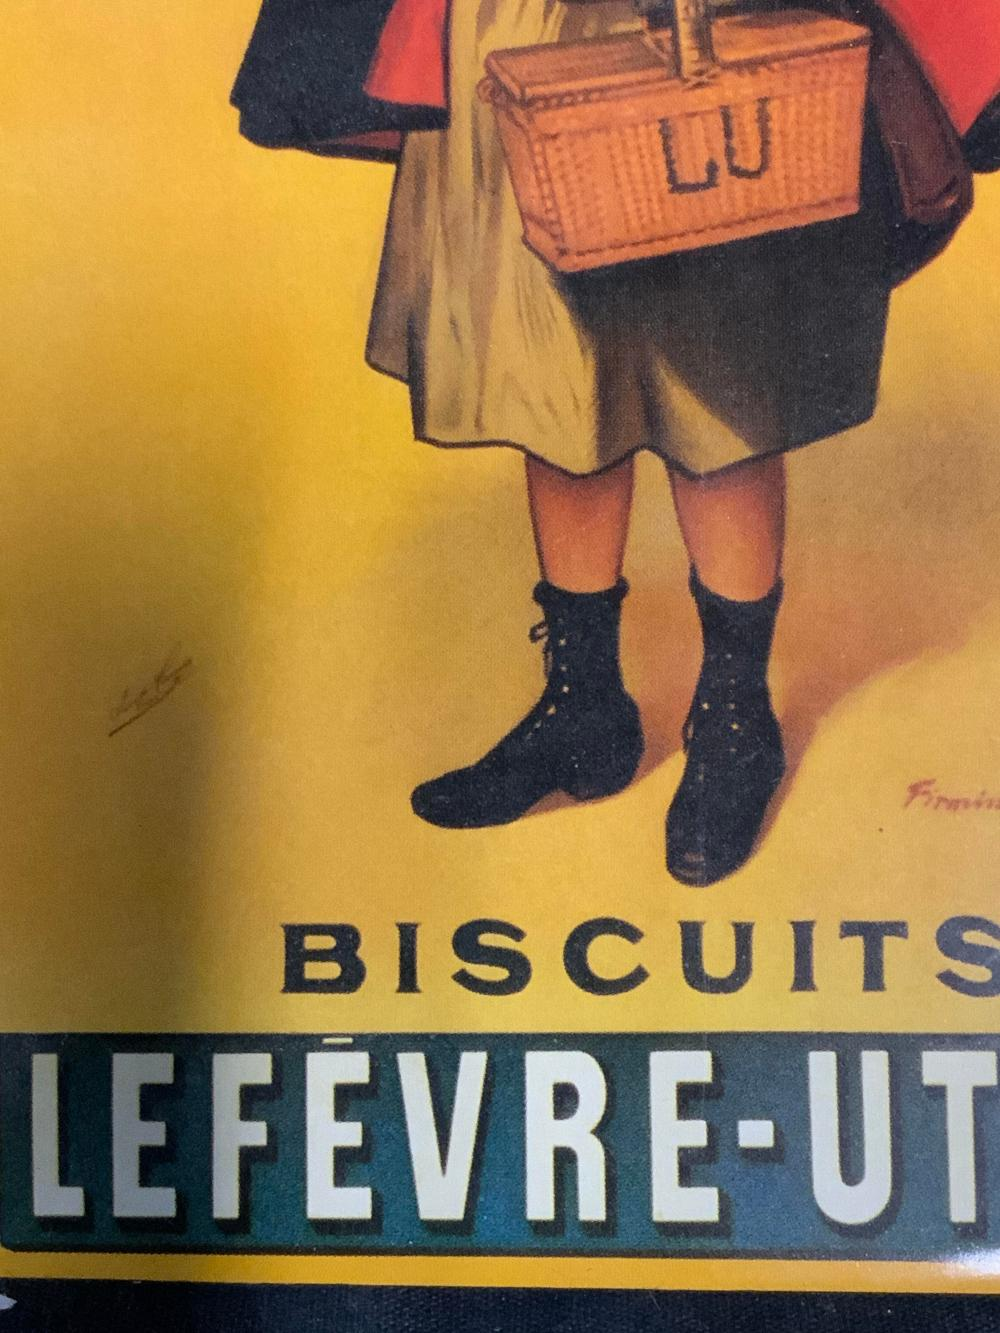 FIRMIN BOUISSET Vintage Lu Lu Biscuits Artwork